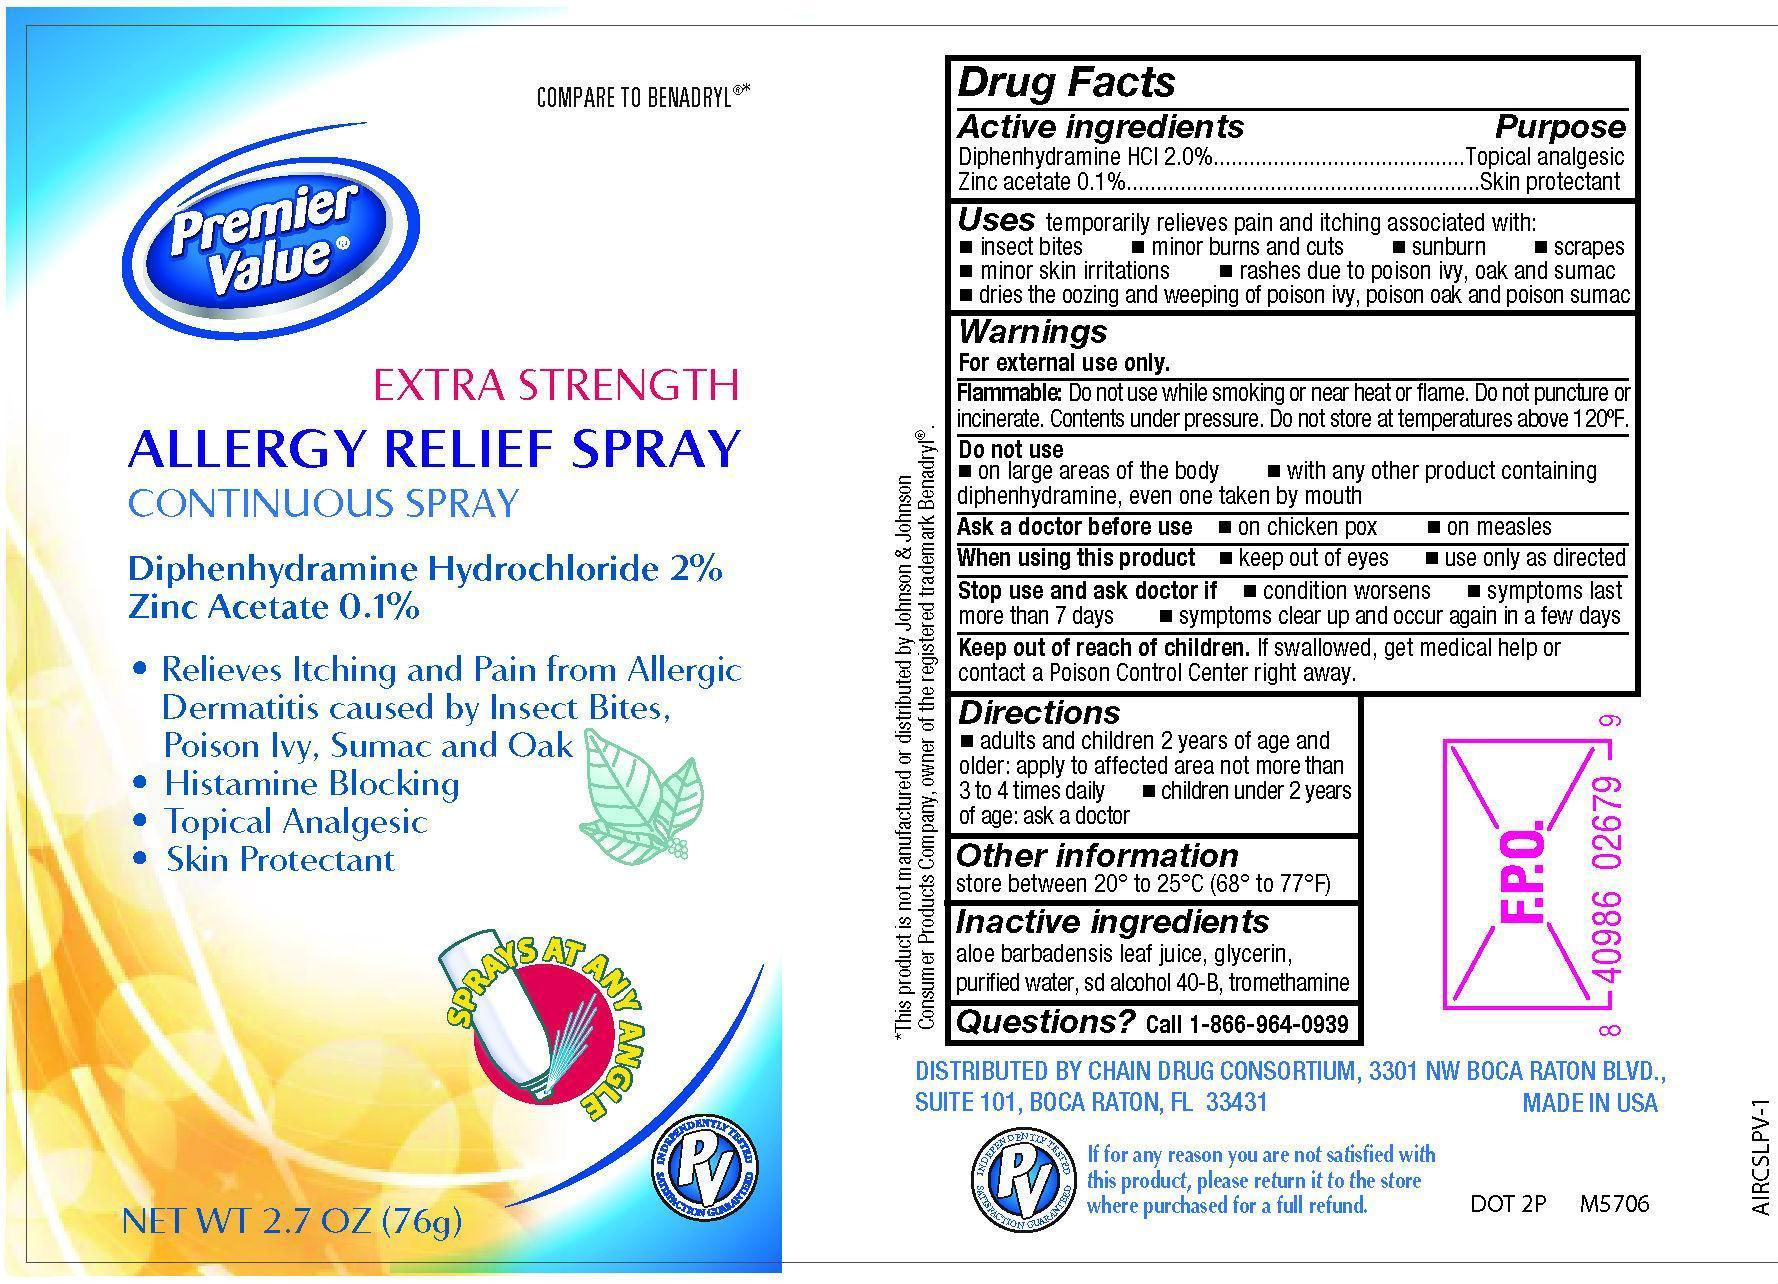 PV Allergy Relief Spray2.jpg